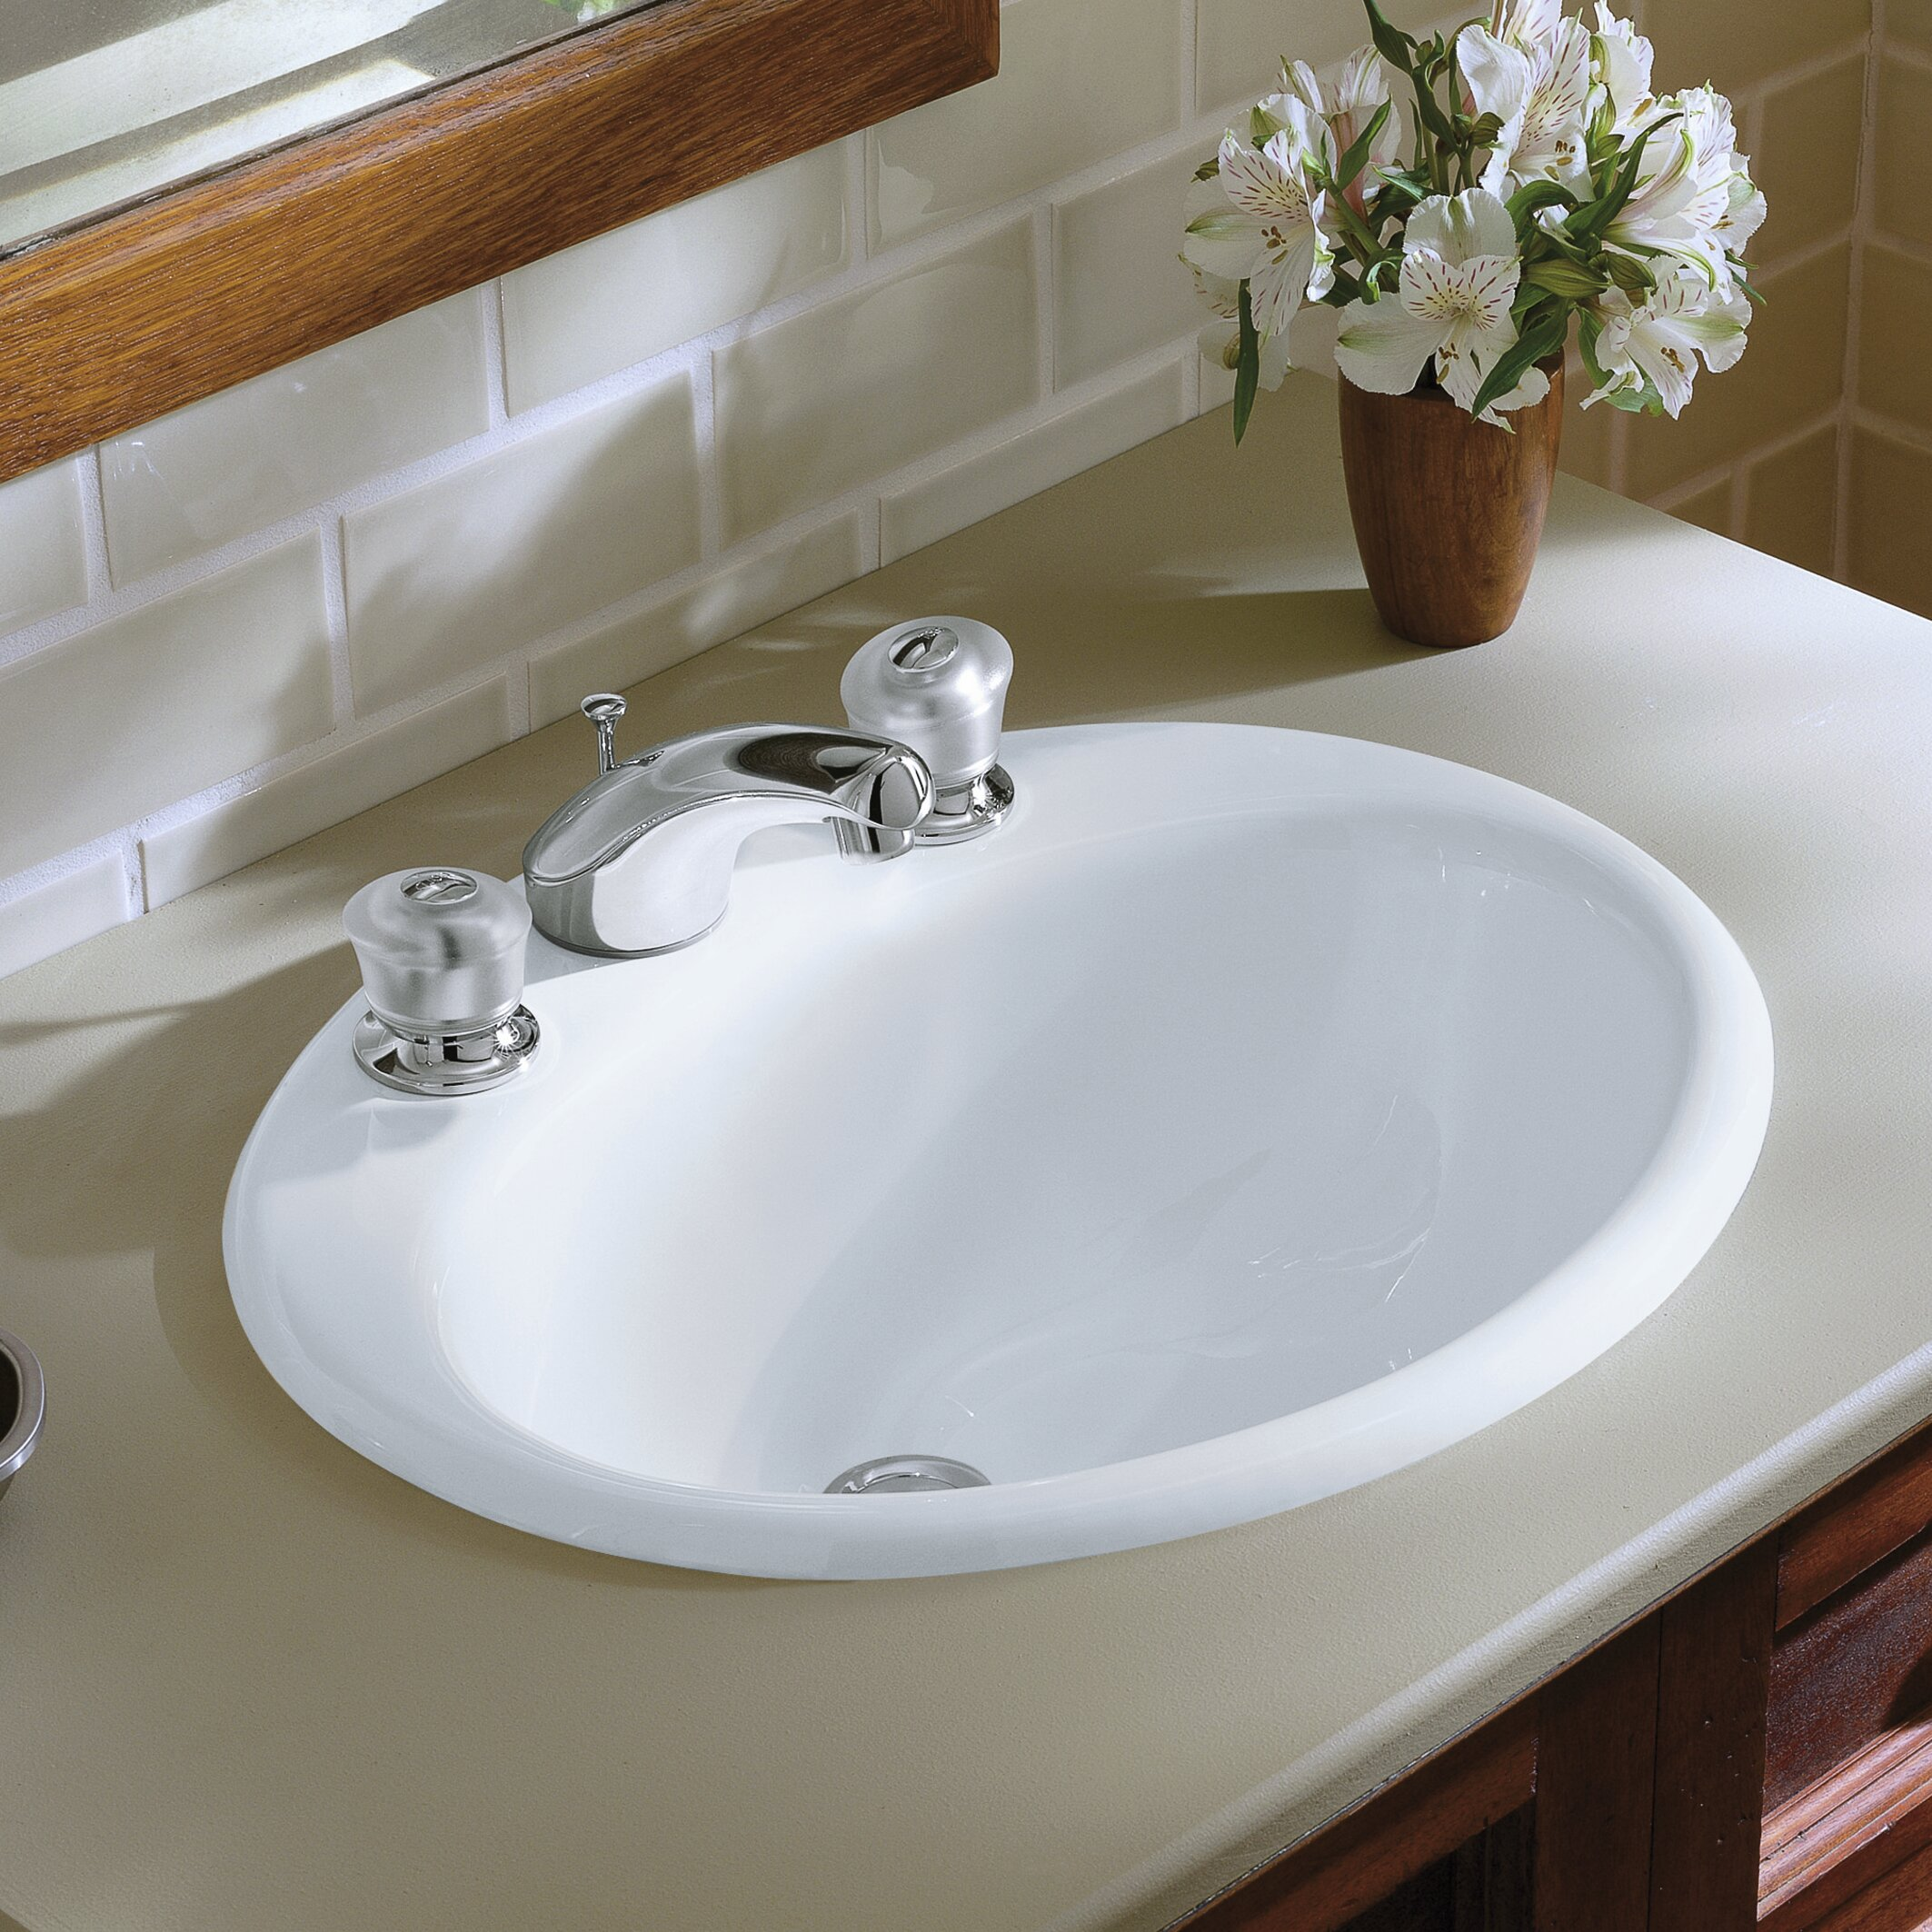 K-2905-8-0,20,47 Kohler Farmington Metal Oval Drop-In Bathroom Sink ...